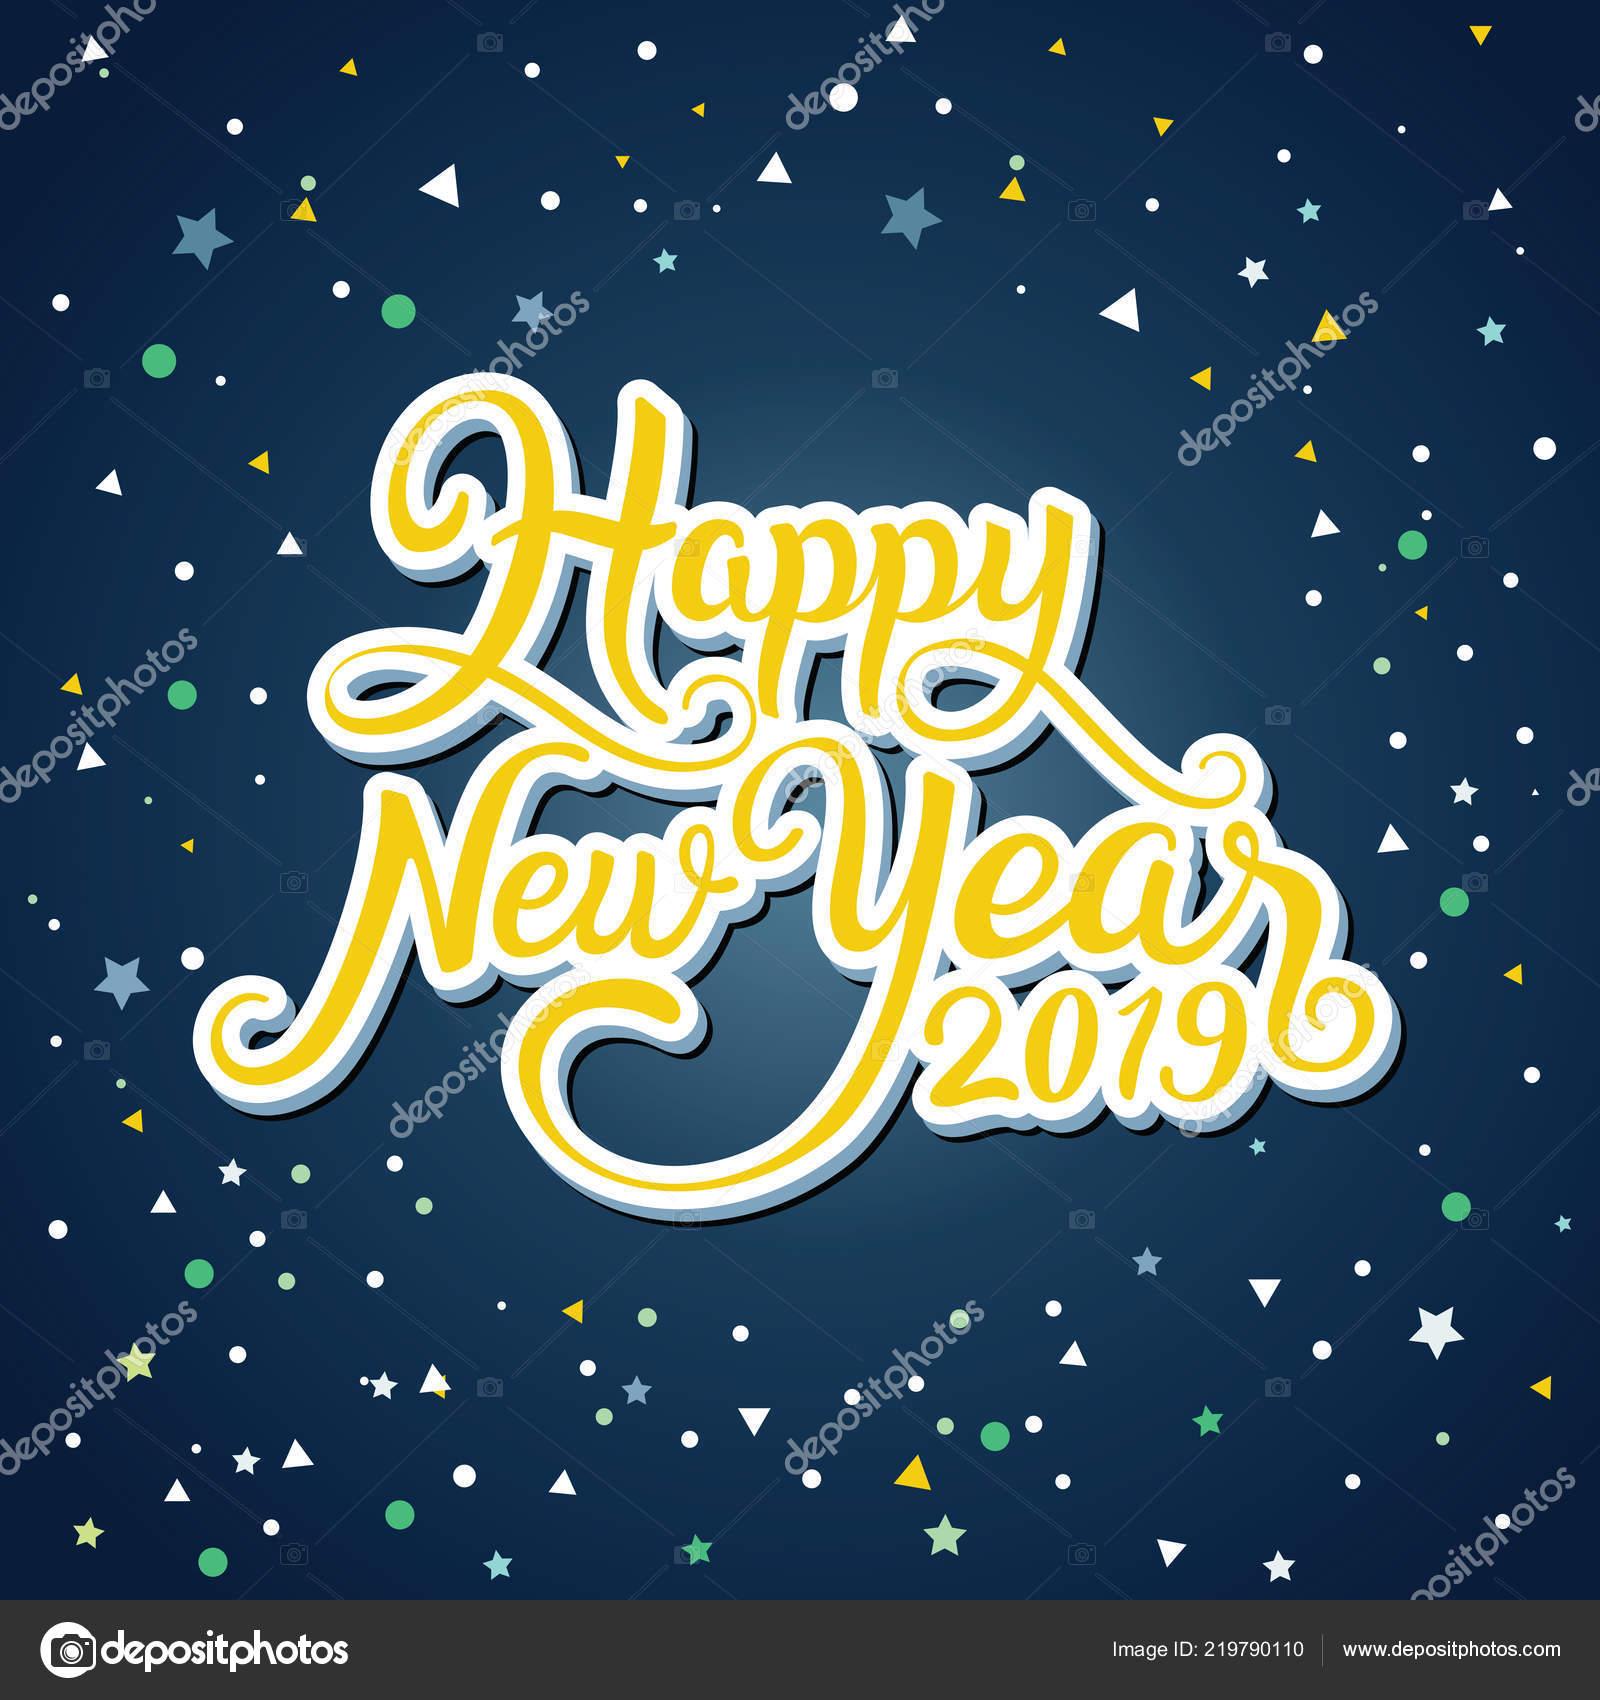 happy new year 2019 handwritten typography night sky background stock vector